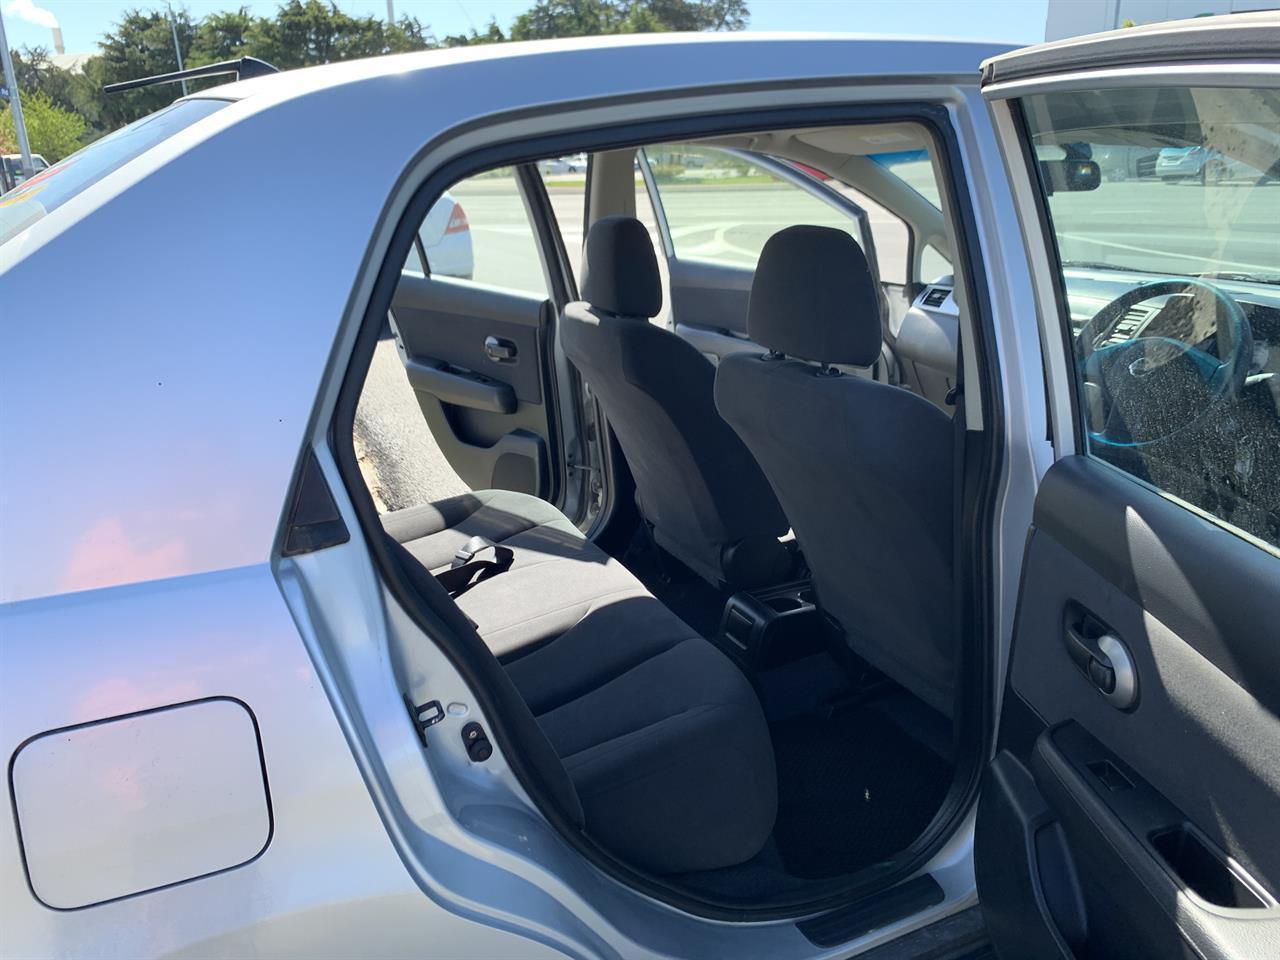 image-12, 2011 Nissan Tiida LATIO SILVER SALOON at Christchurch